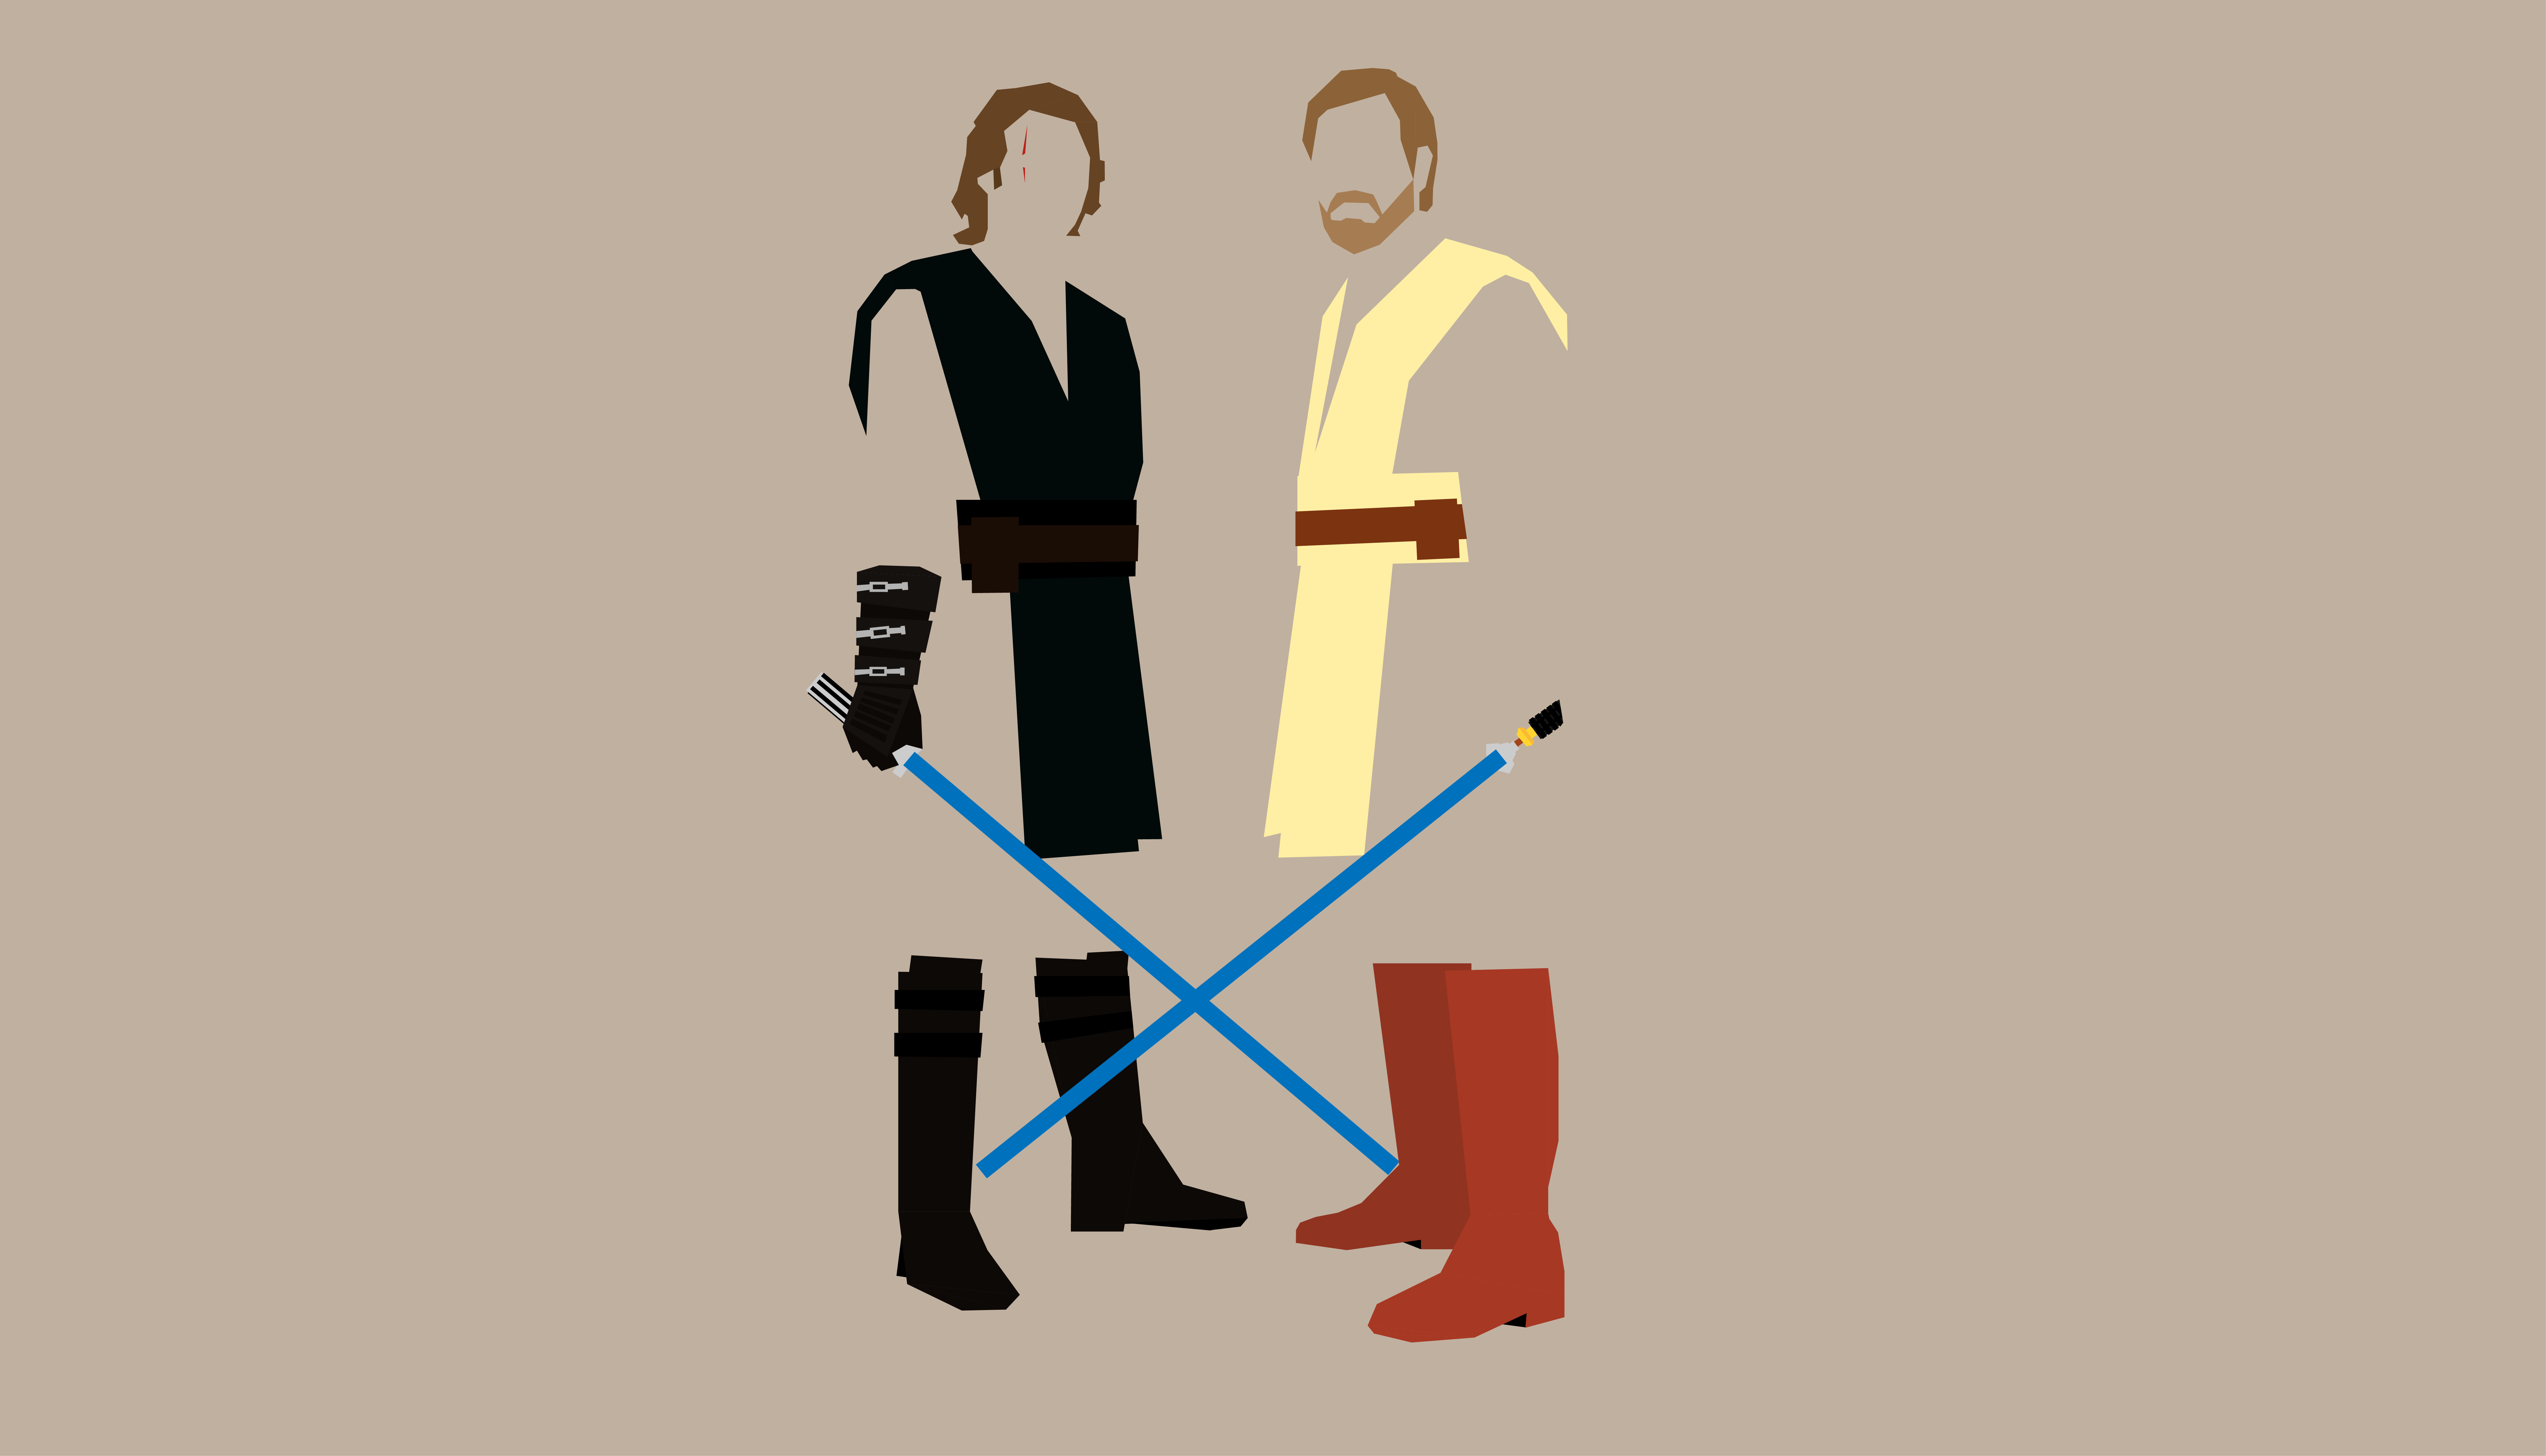 2560x1440 Obi Wan Kenobi And Anakin Skywalker 1440p Resolution Wallpaper Hd Minimalist 4k Wallpapers Images Photos And Background